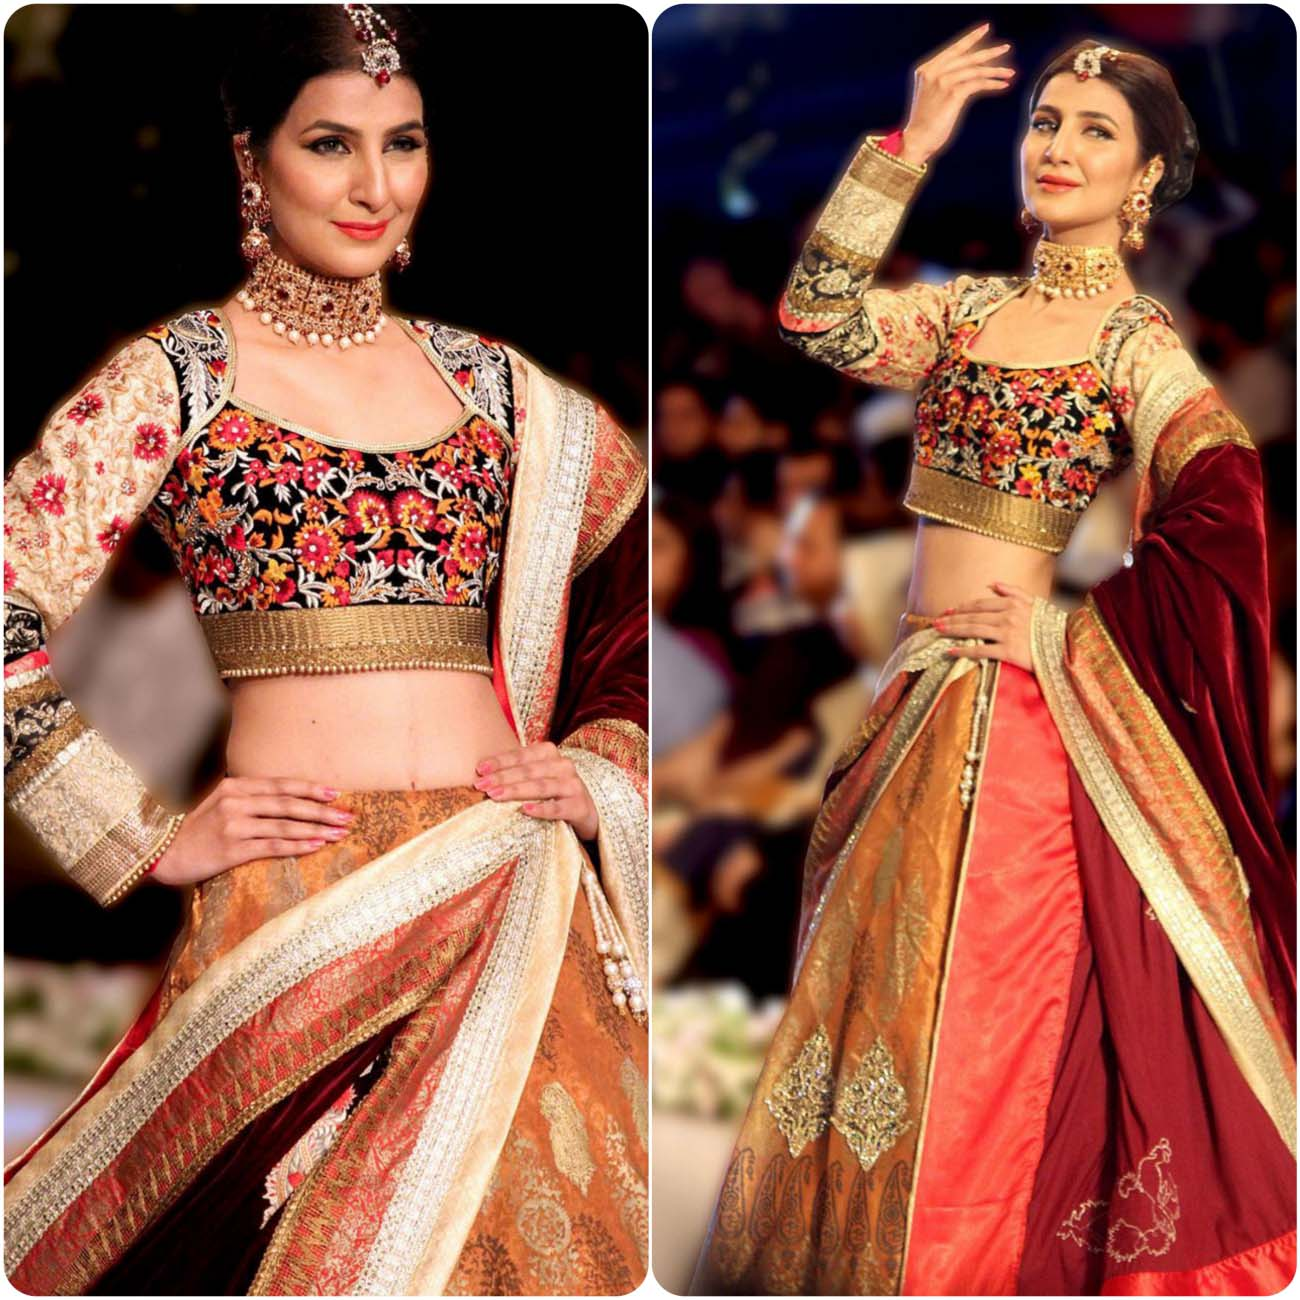 Deepak perwani Wedding Dresses Collection Fo Women 2016-2017...styloplanet (12)